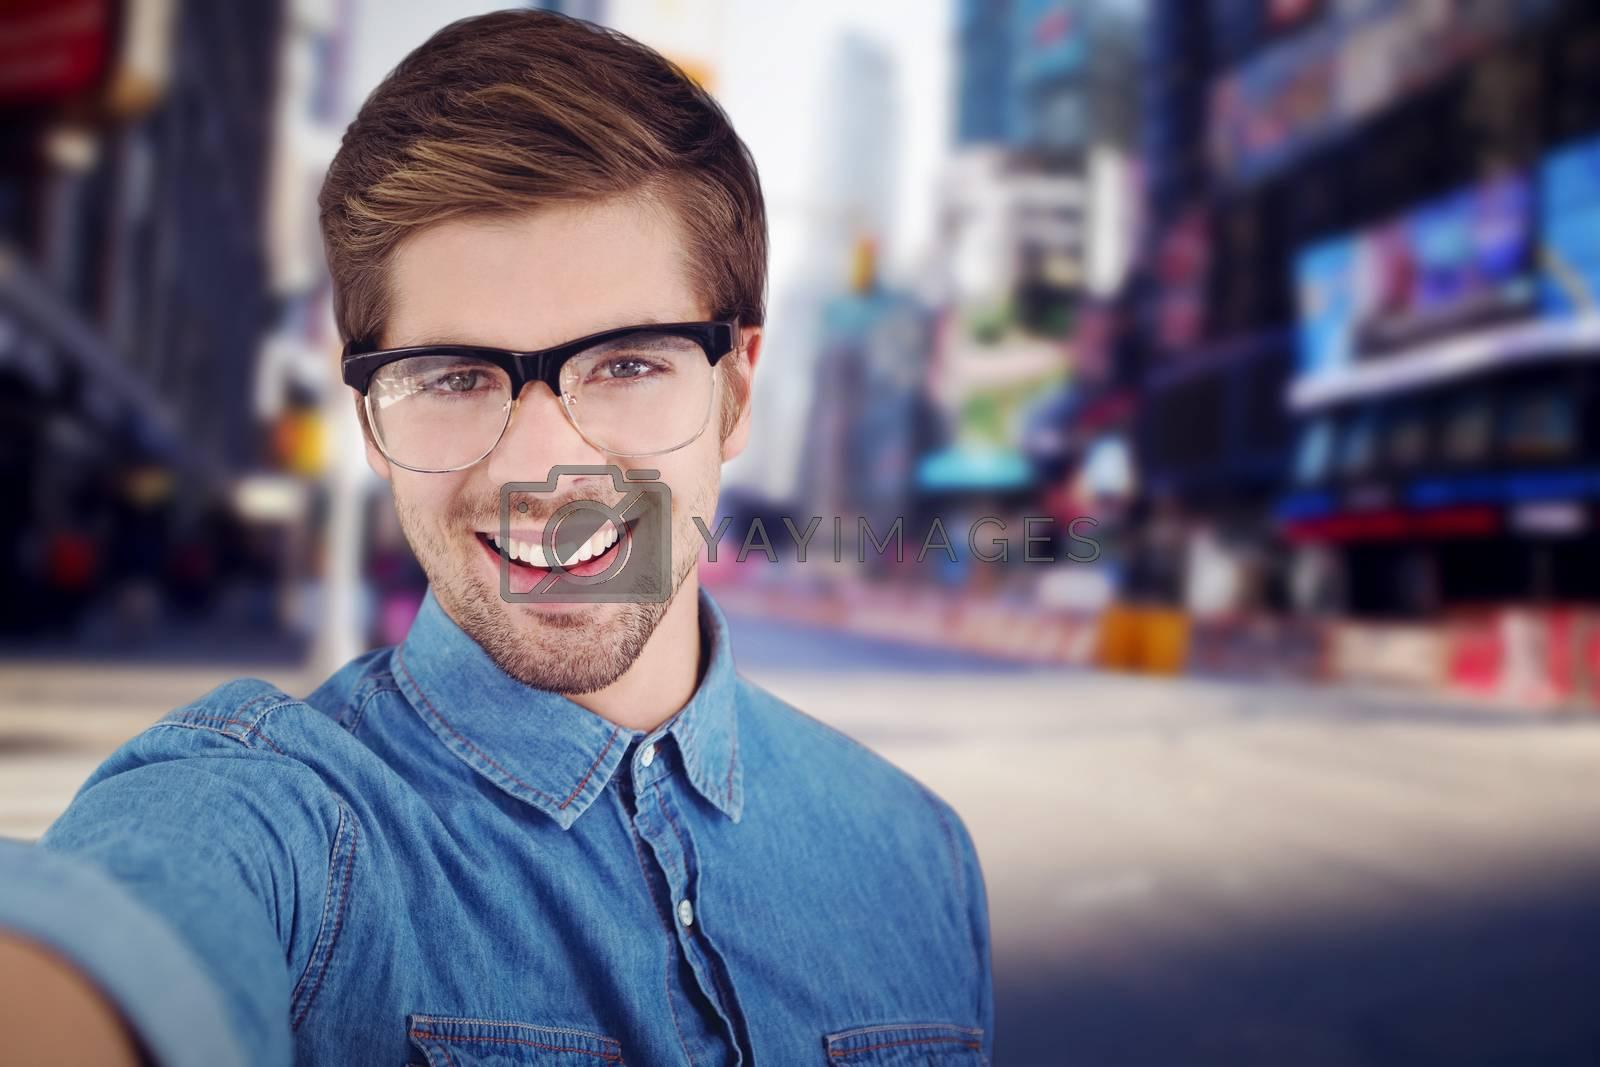 Portrait of happy man wearing eye glasses against blurry new york street